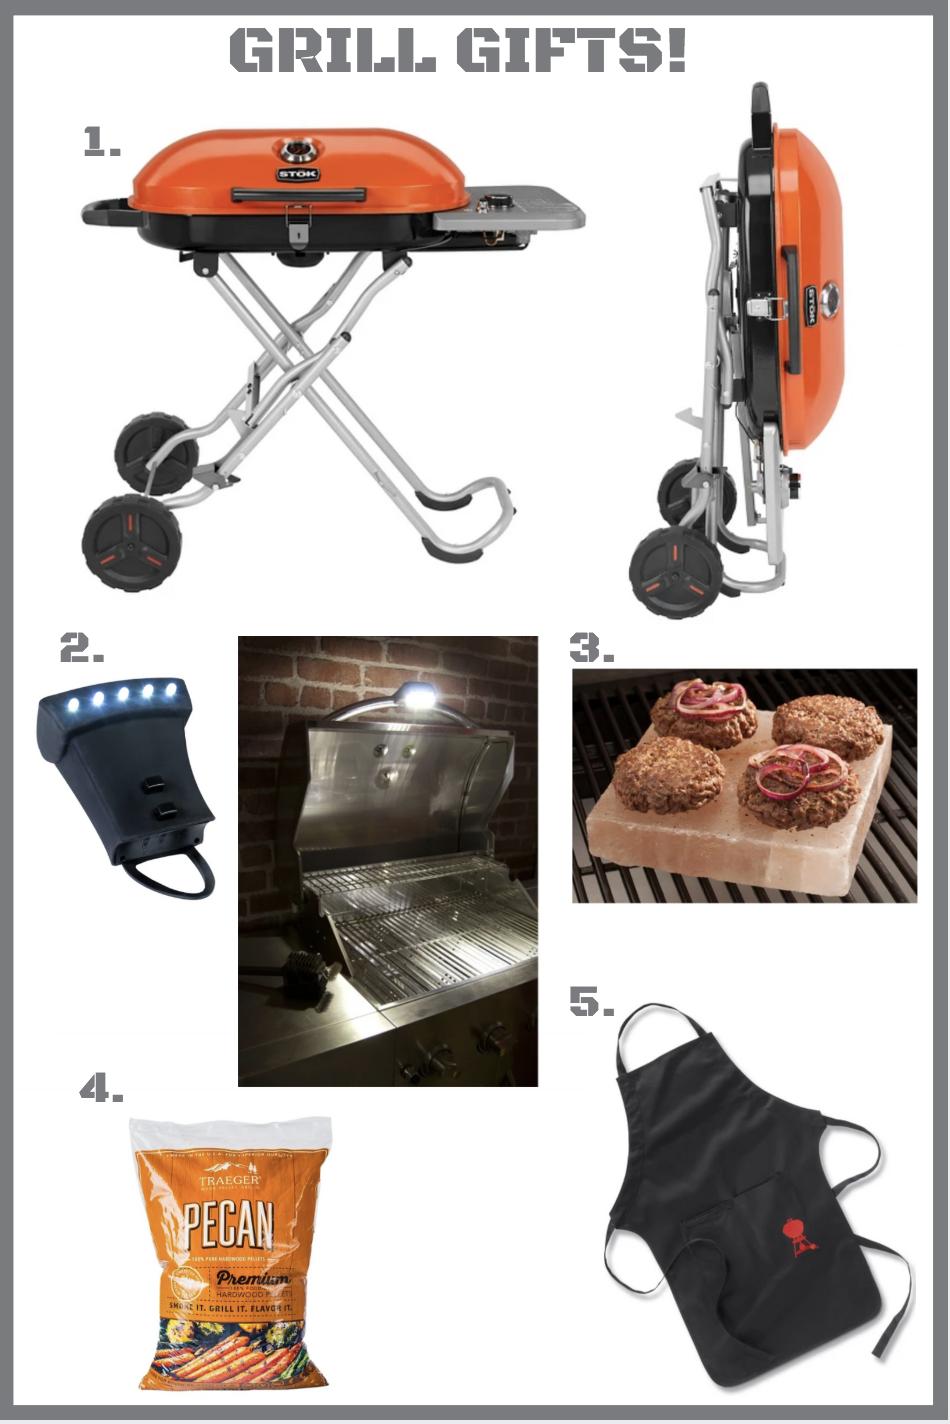 Best Grilling Gift Guide | Jana Donohoe Designs | Fayetteville, North Carolina | www.janadonohoedesigns.com